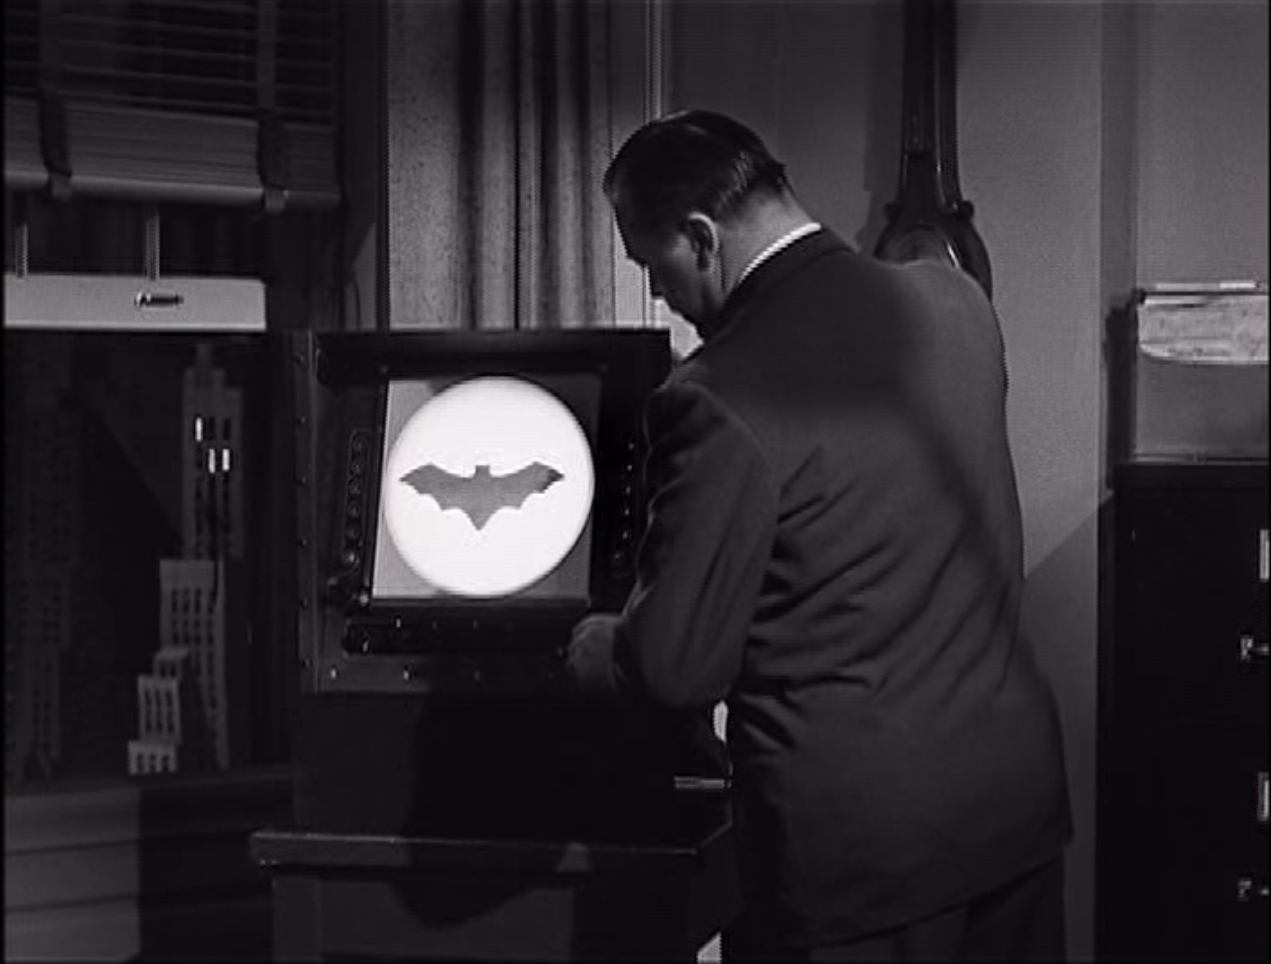 Fates Worse Than Death: Batman and Robin (1949) | Medleyana